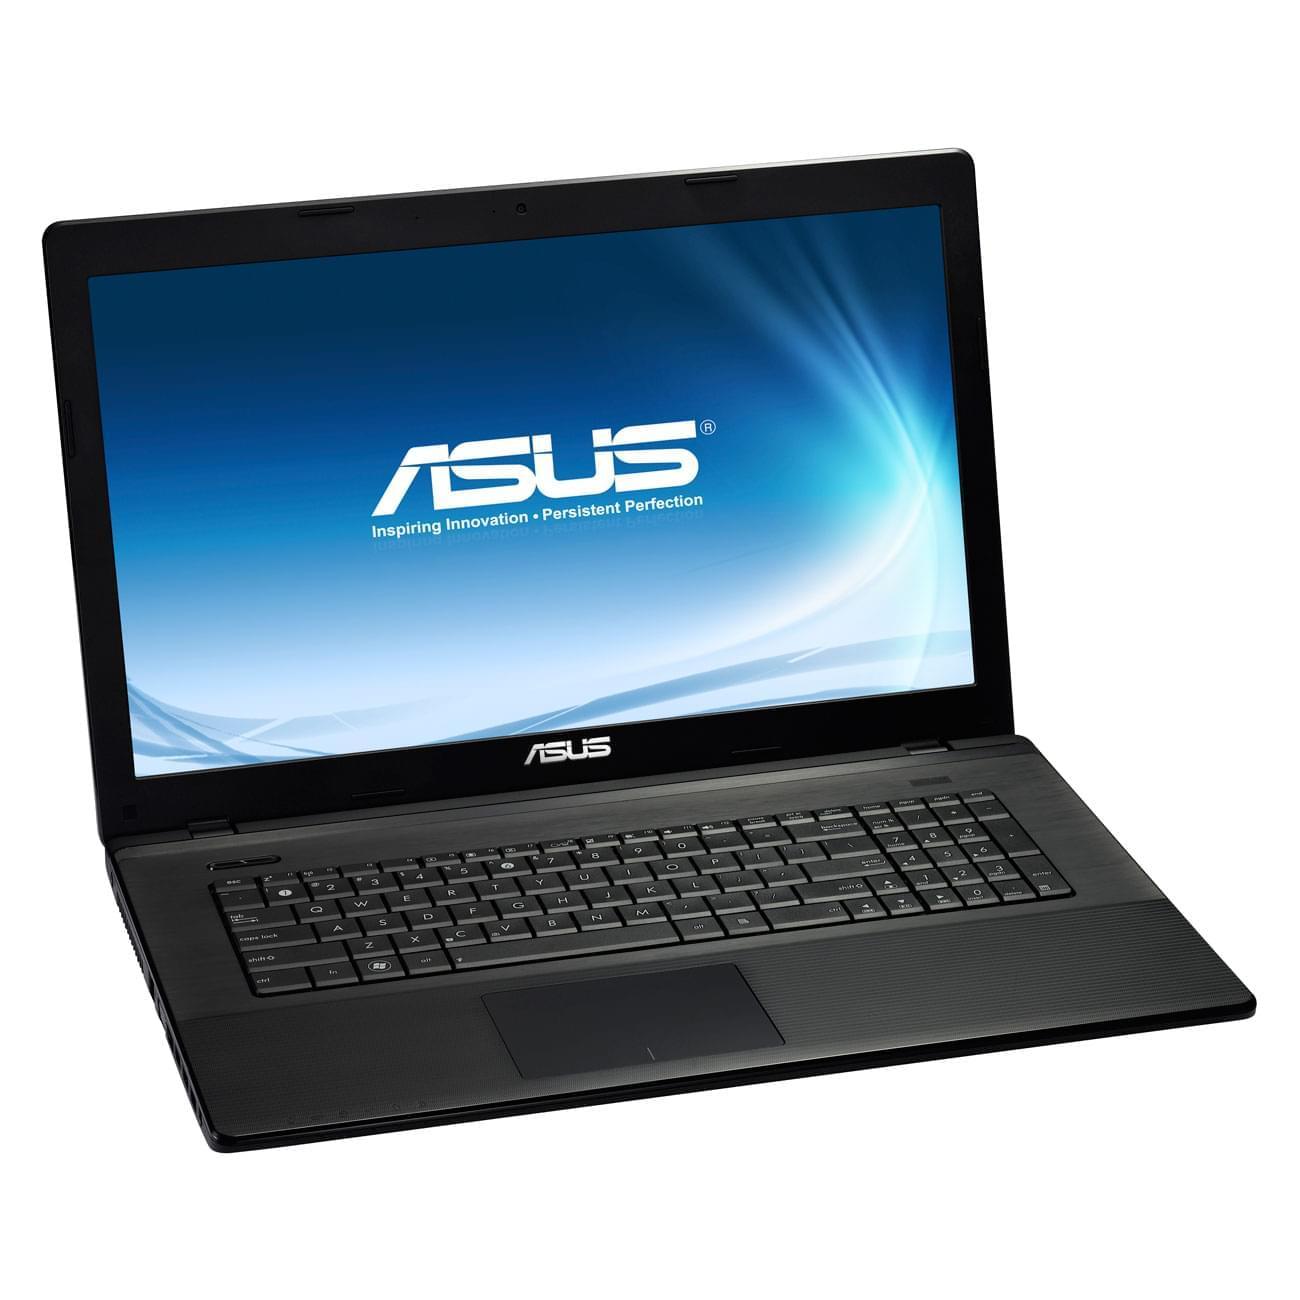 Asus X75A-TY126H (X75A-TY126H) - Achat / Vente PC Portable sur Cybertek.fr - 0